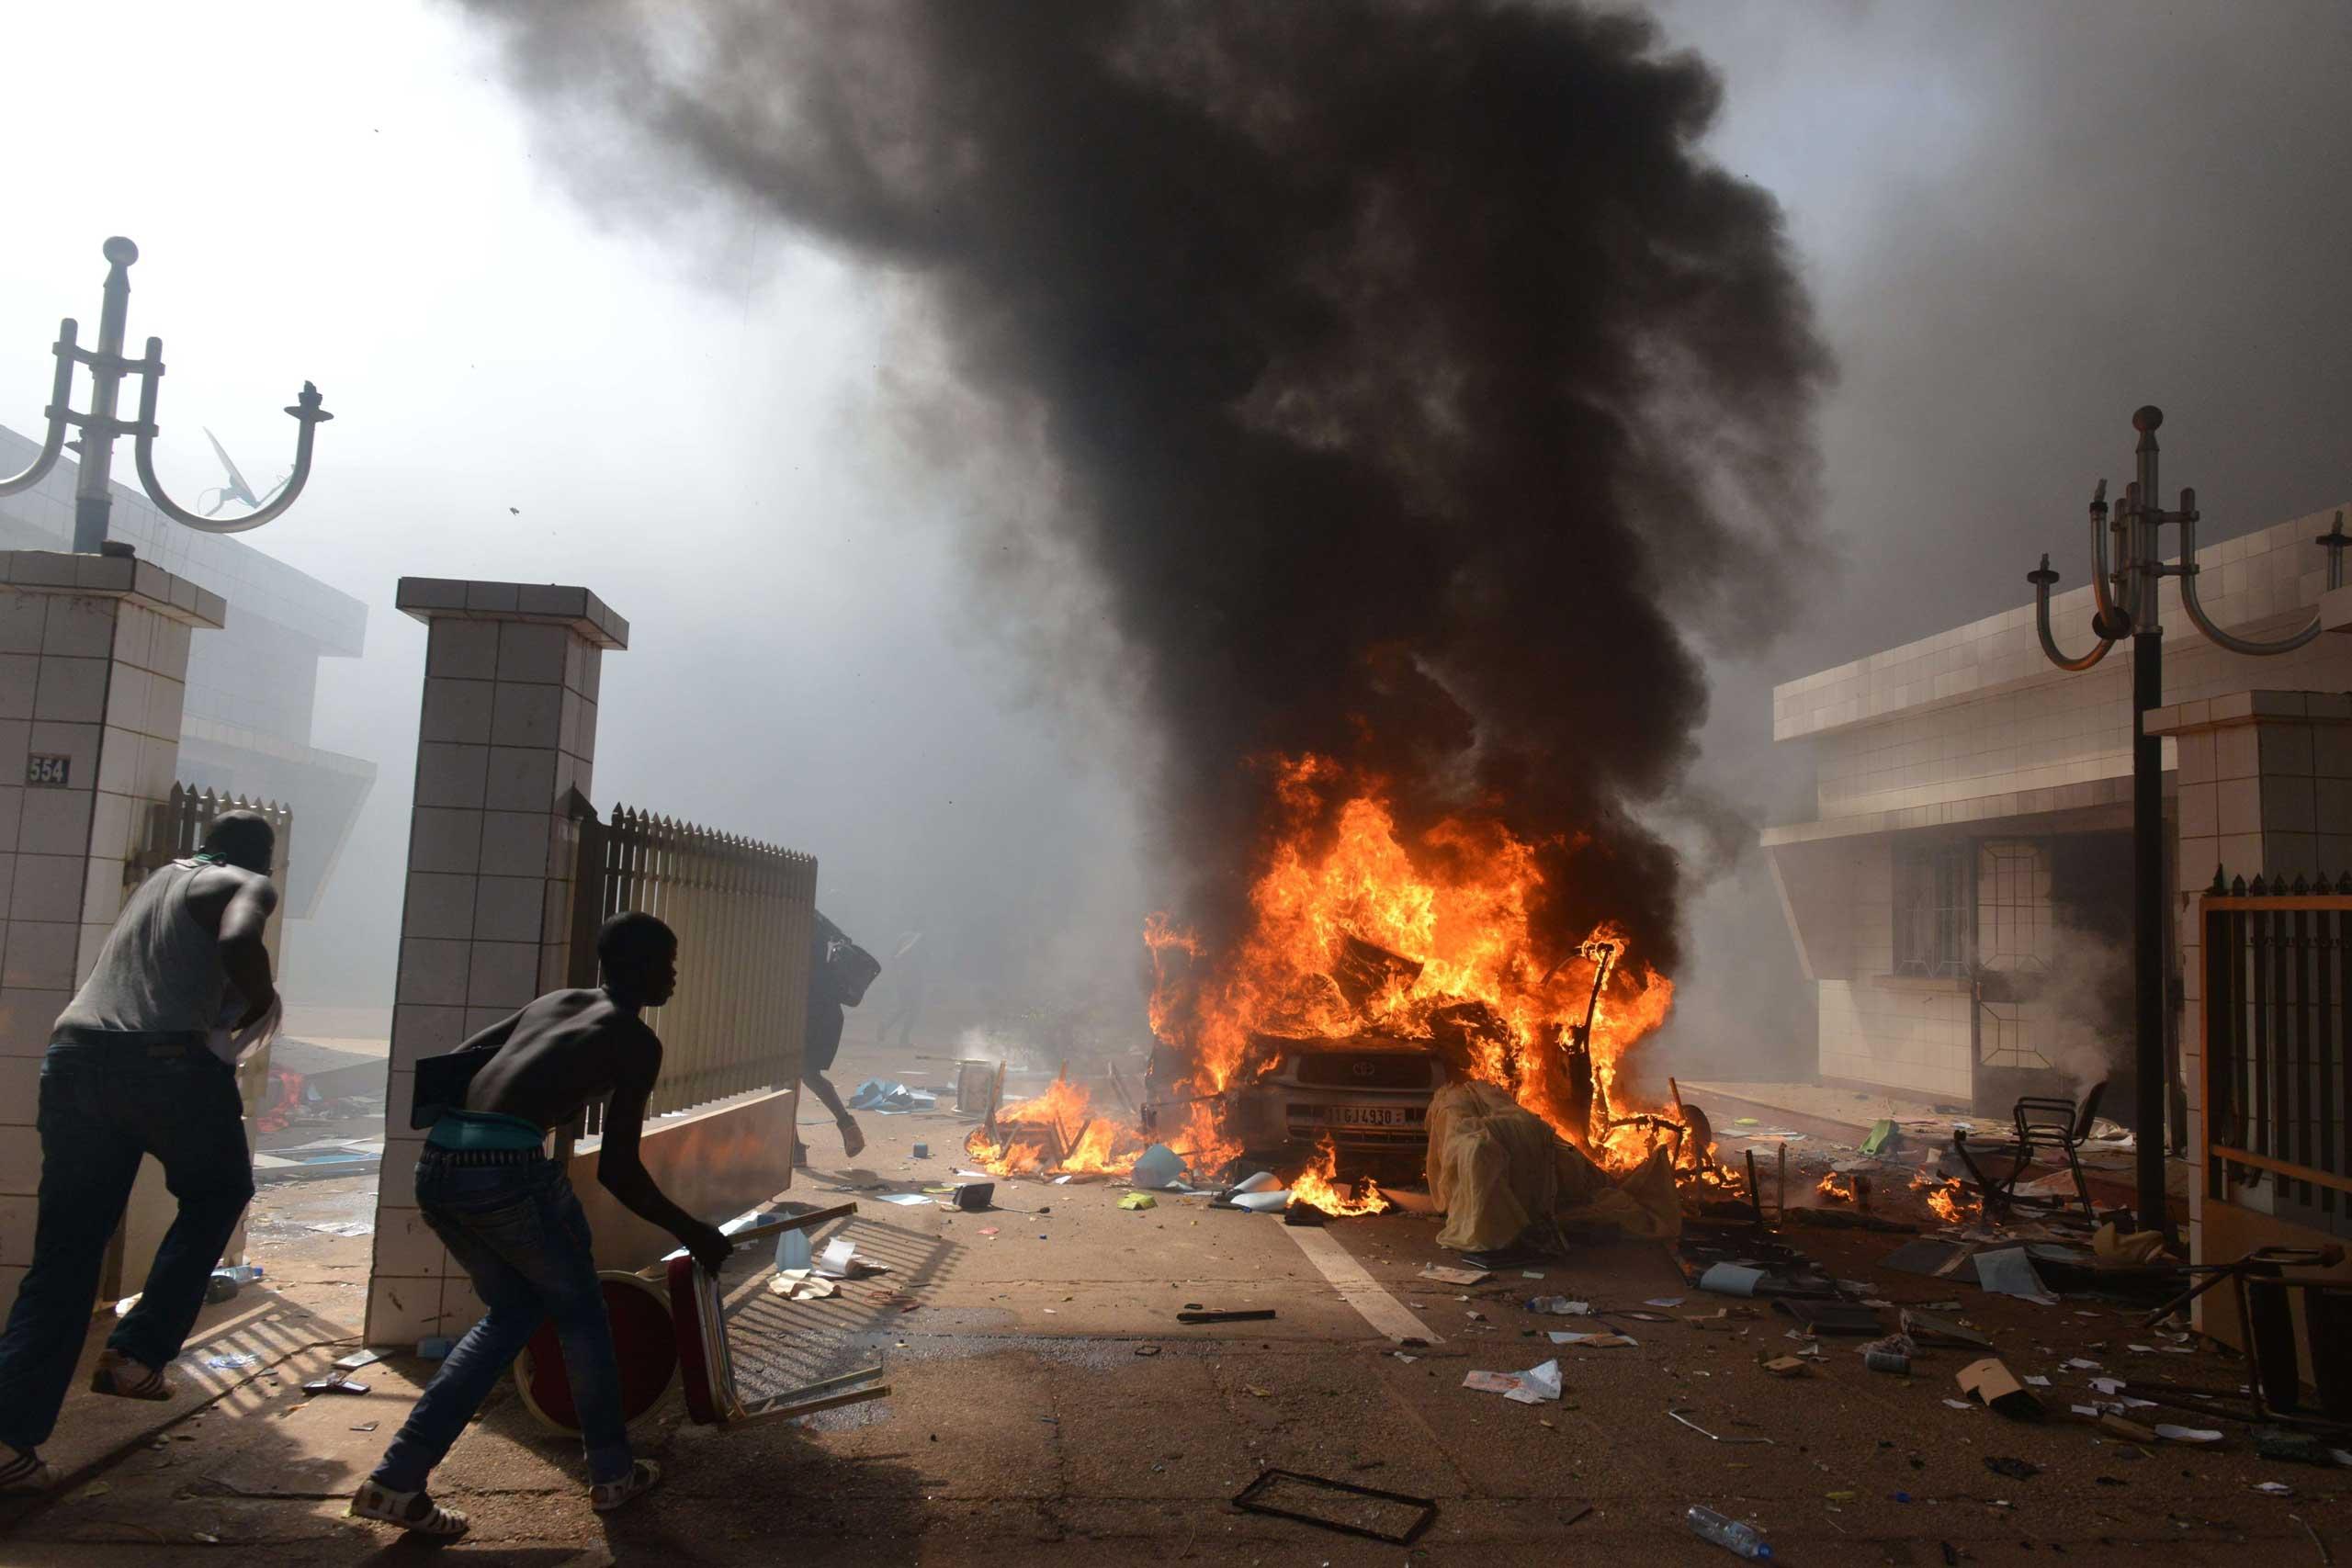 Prostestors enter the parliament in Ouagadougou on Oct. 30, 2014.